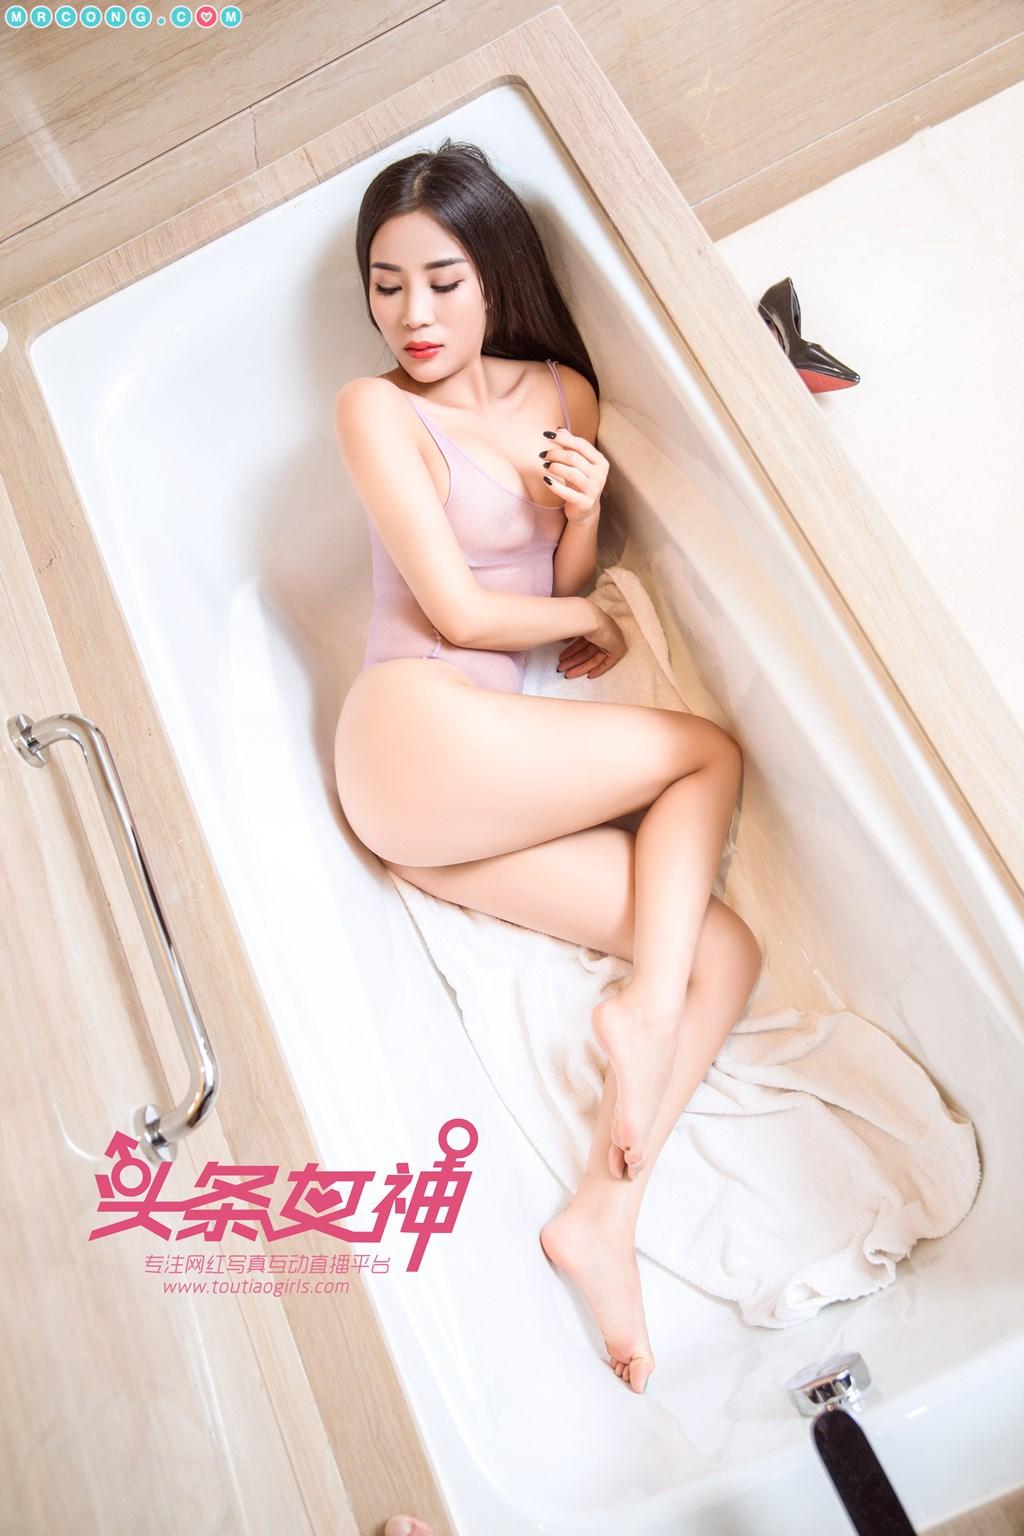 Image TouTiao-2017-12-18-Su-Mo-MrCong.com-002 in post TouTiao 2017-12-18: Người mẫu Su Mo (苏沫) (31 ảnh)